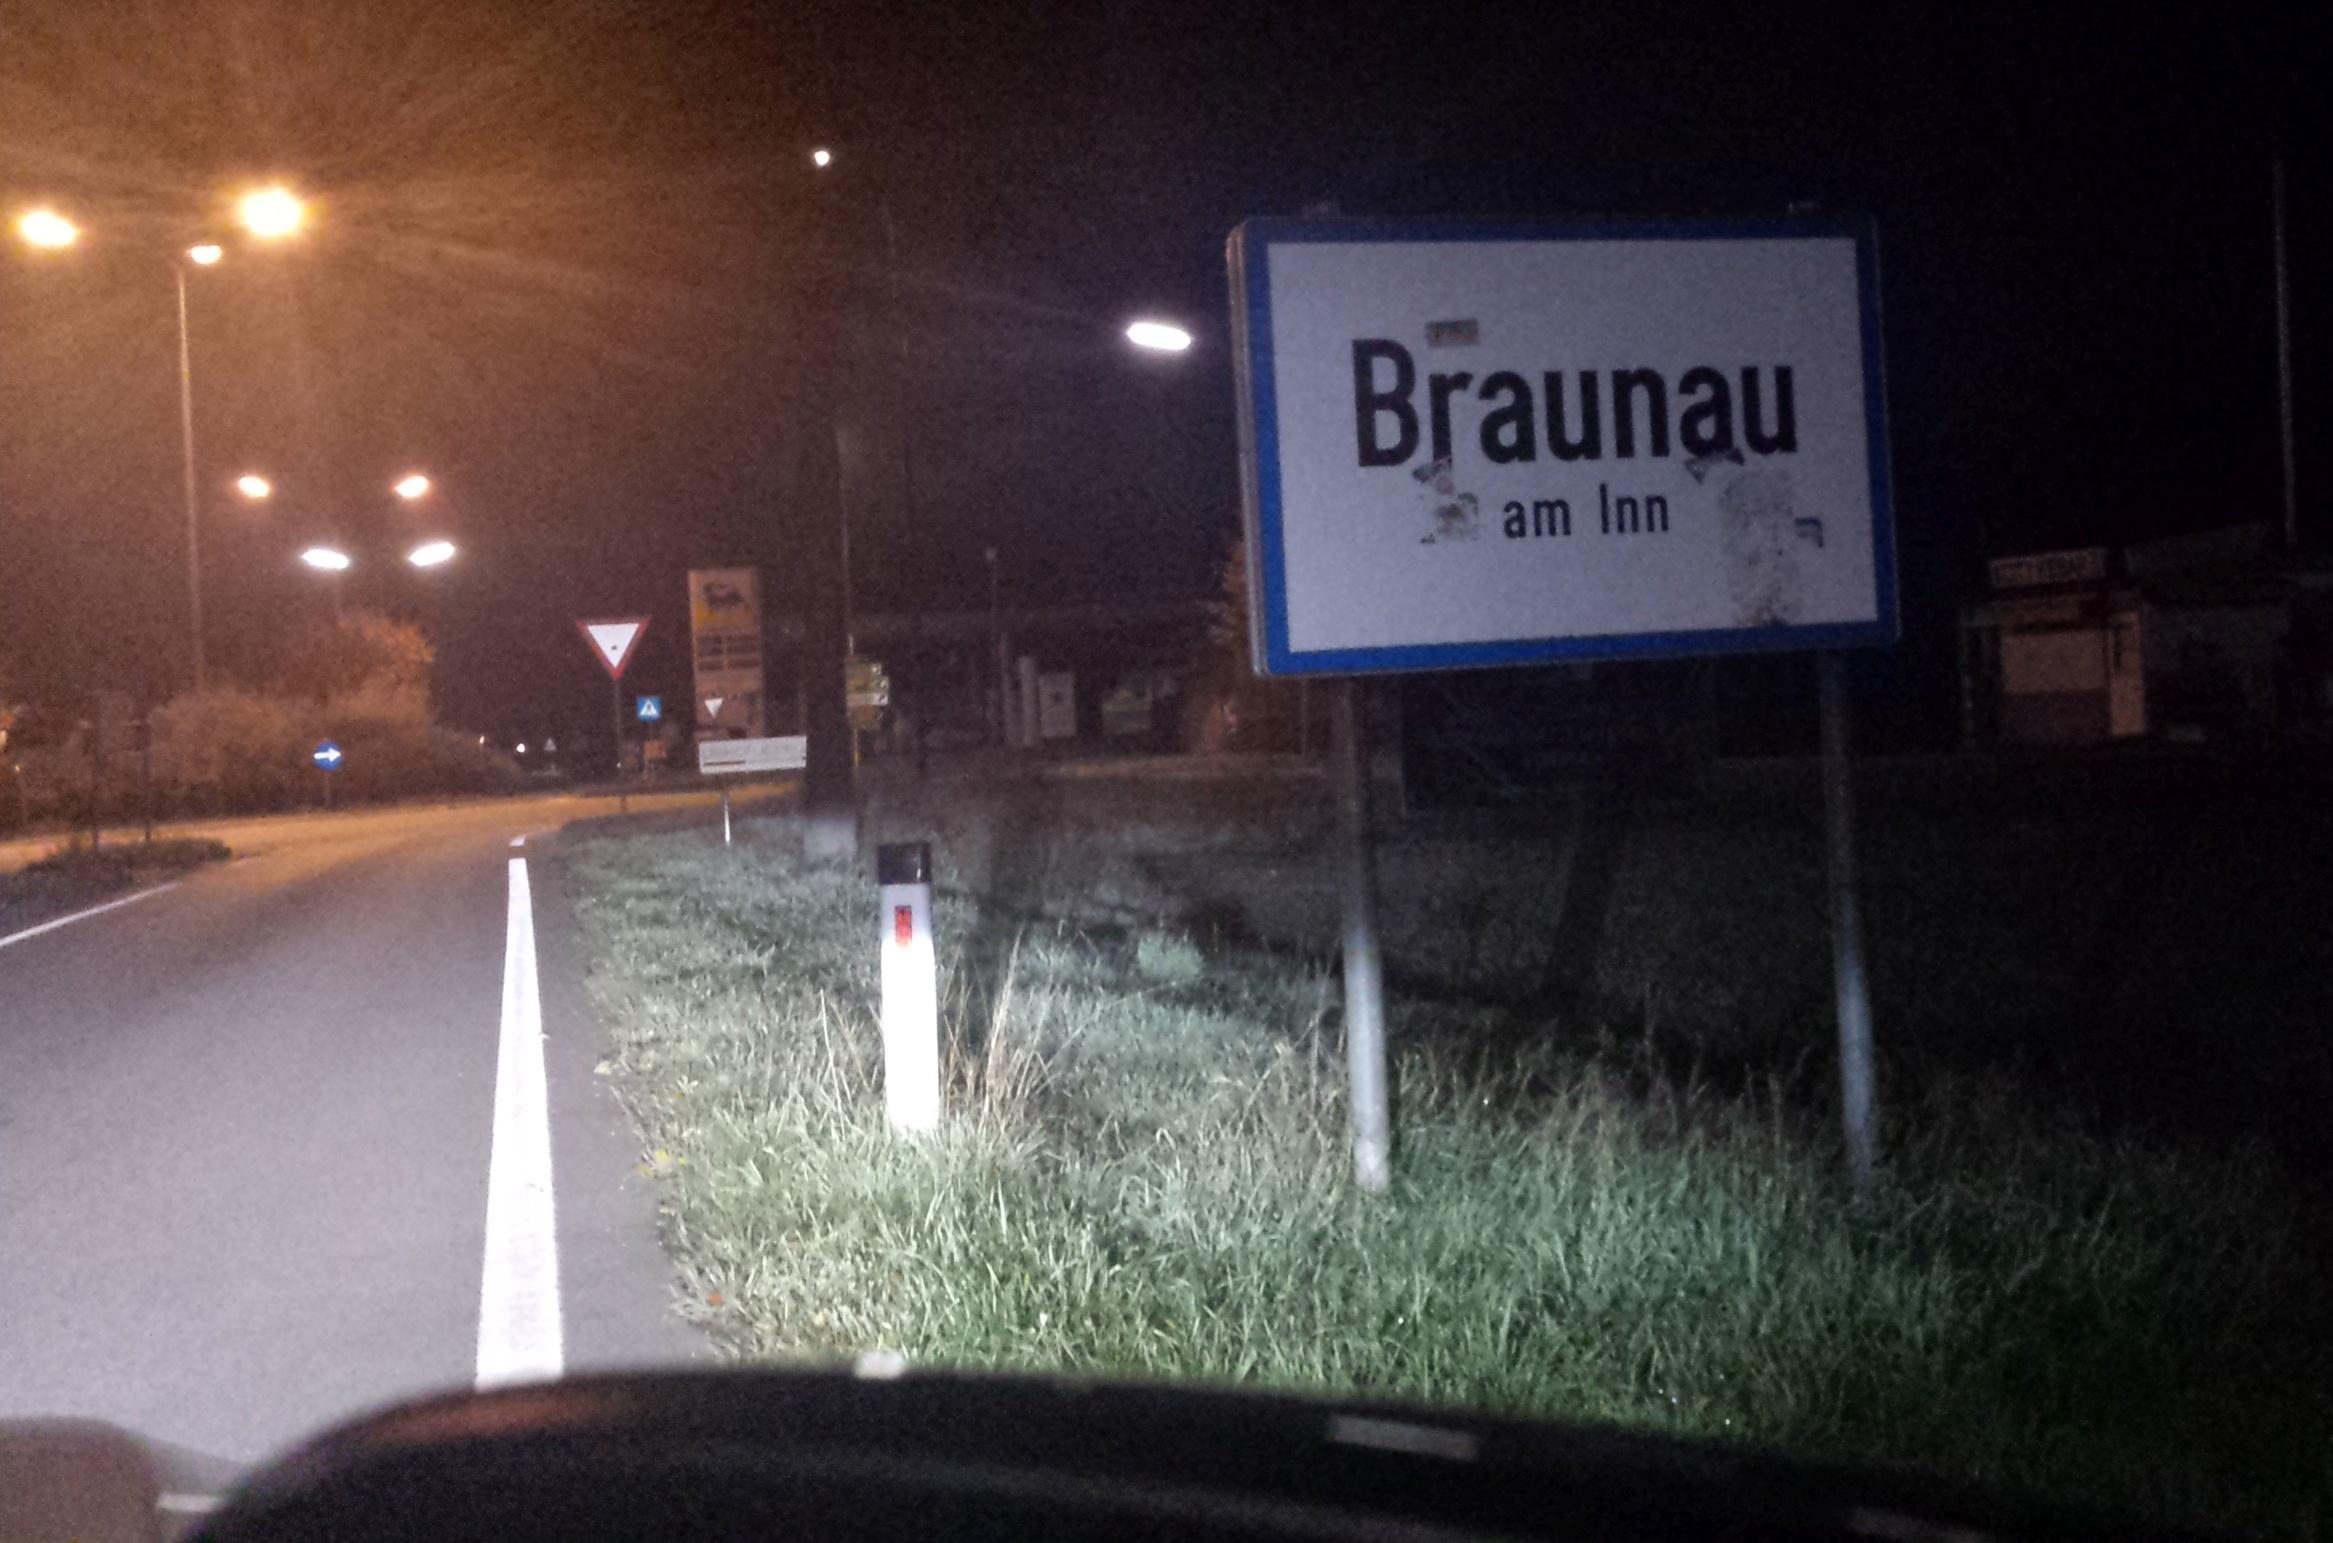 Day 13: Braunau / Simbach